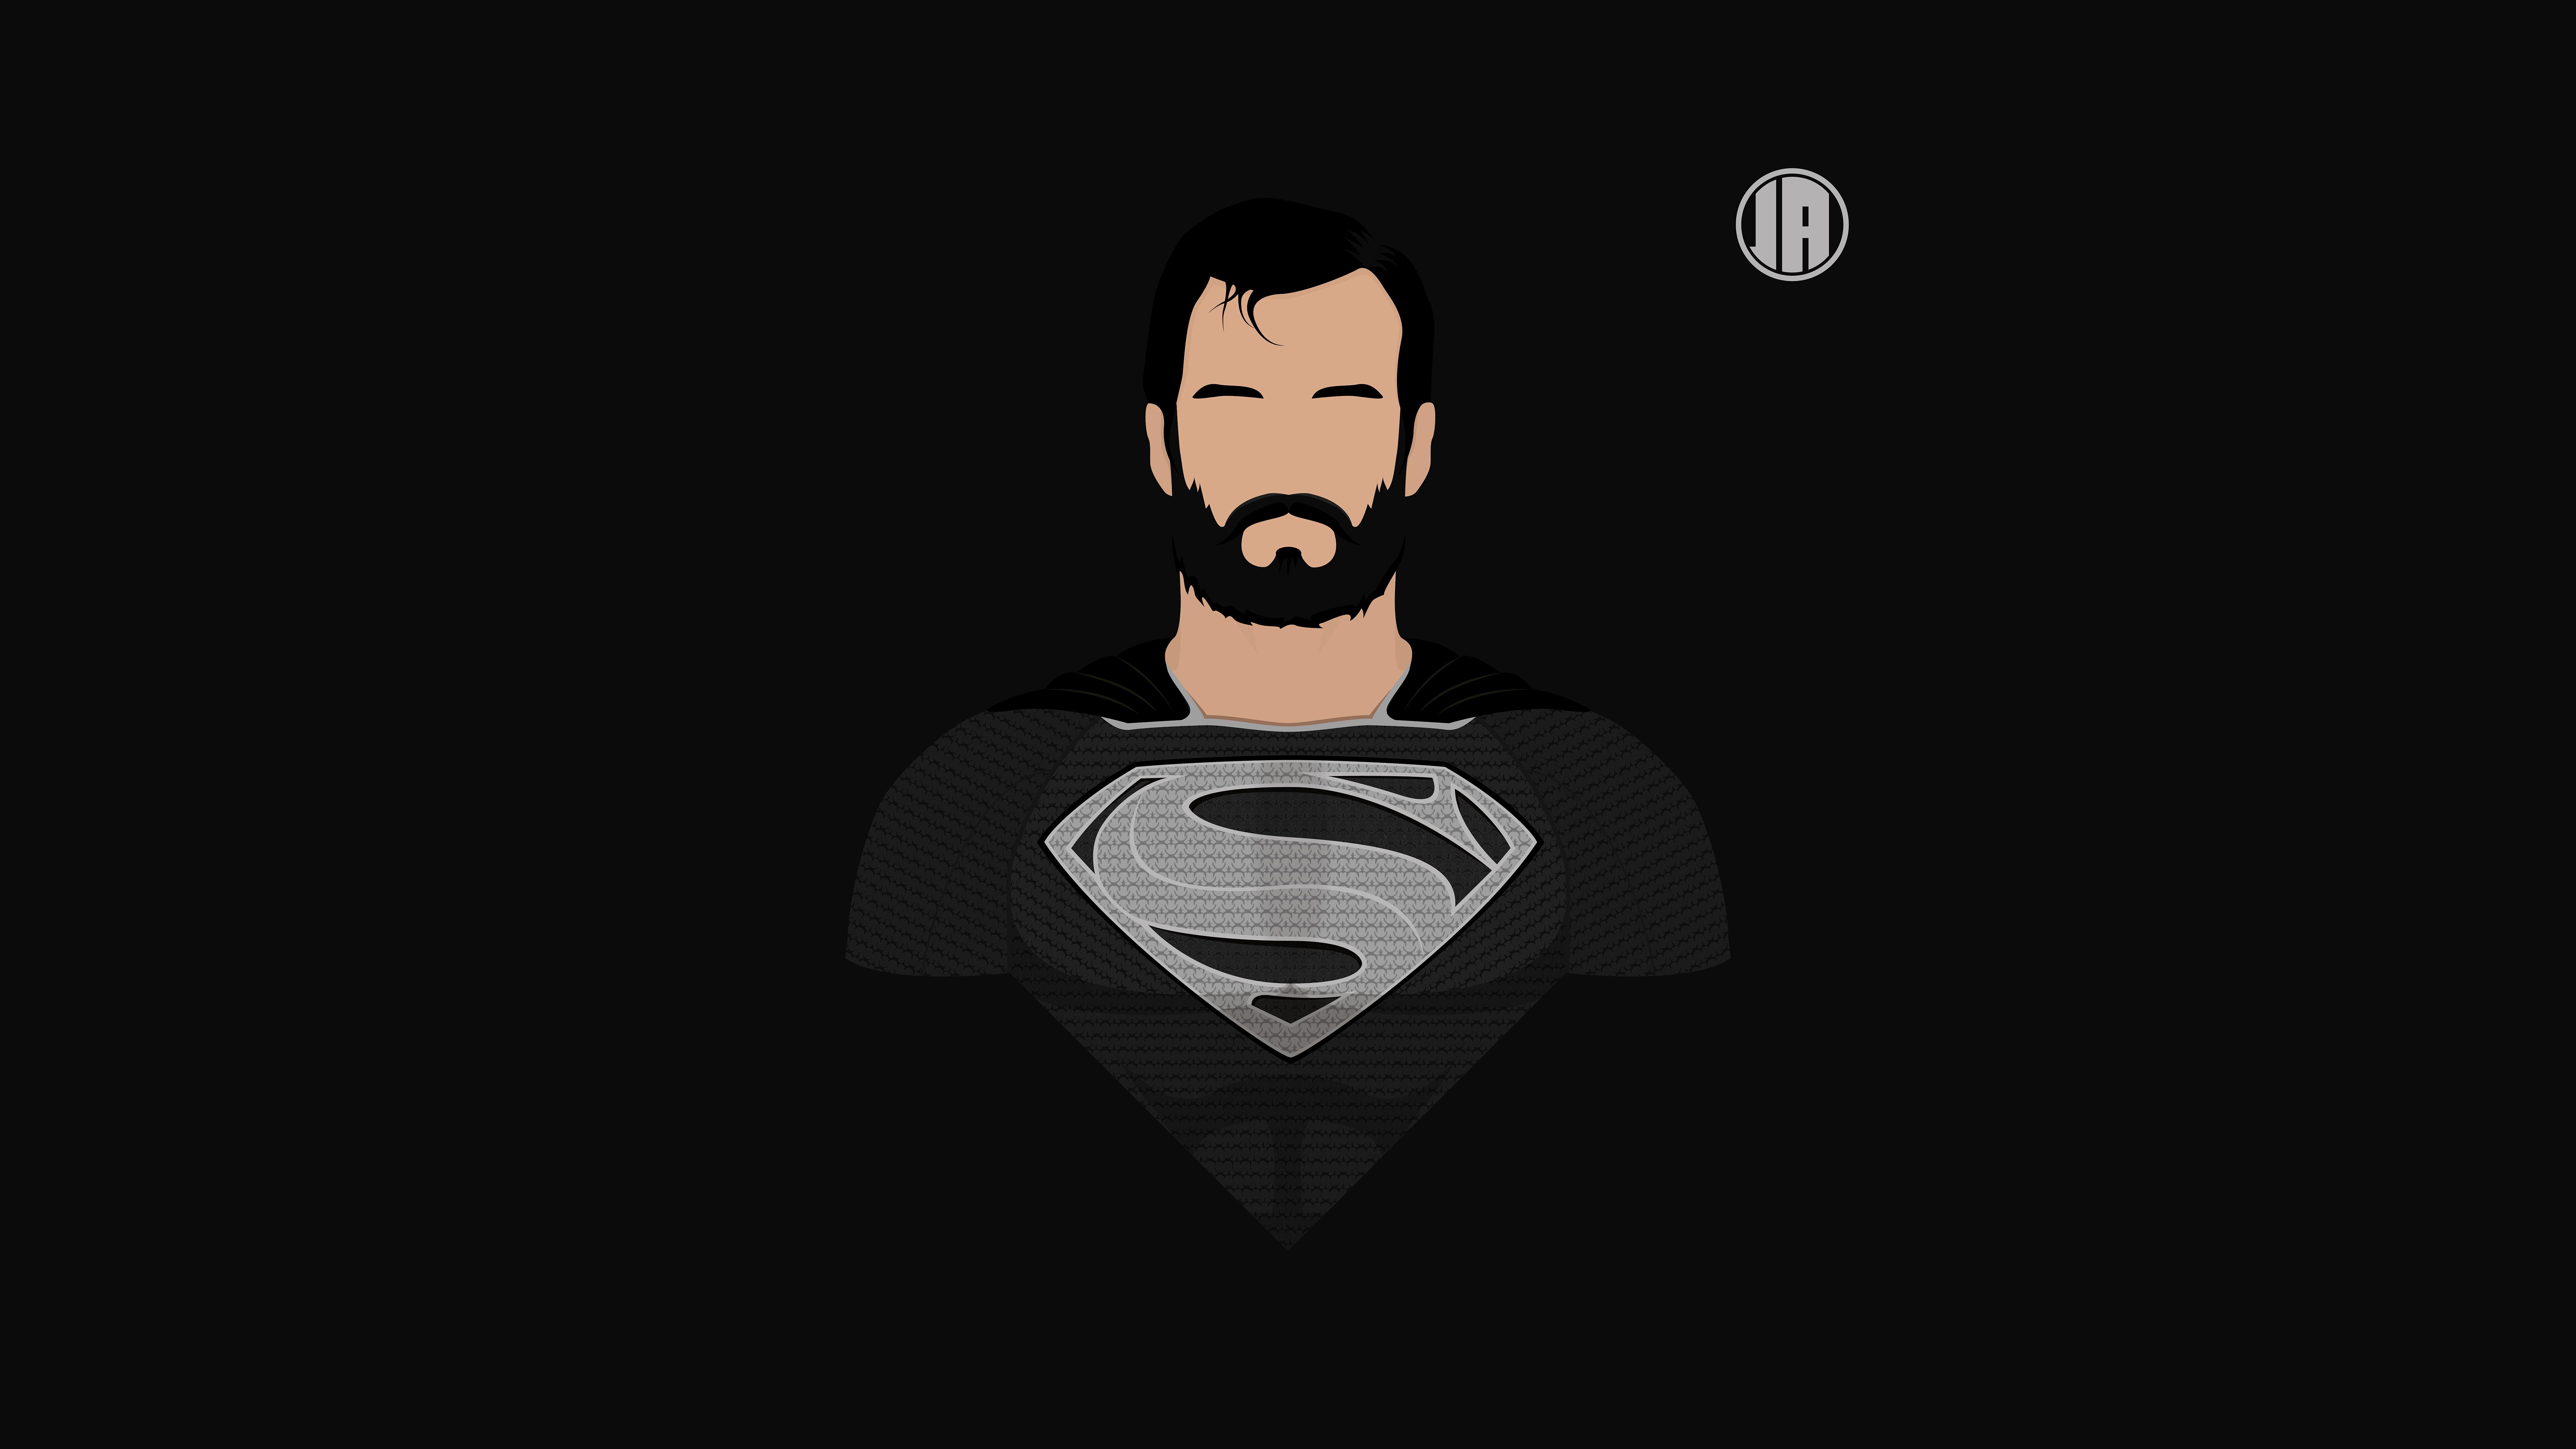 Unduh 1000 Wallpaper Hd Superman HD